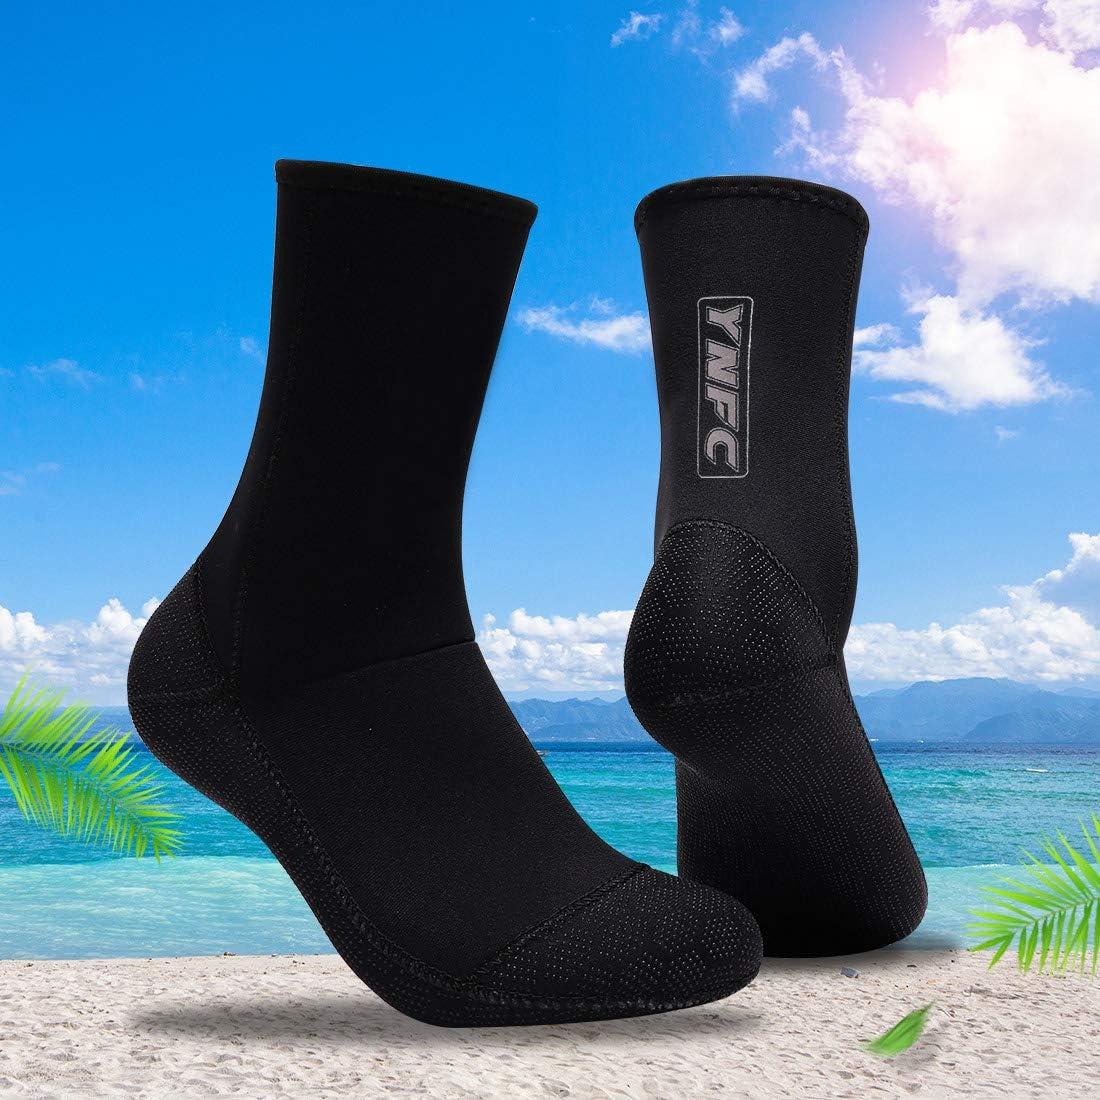 YNFC Diving Socks Neoprene Socks Beach Booties Shoes 3mm Anti-Slip Wetsuit Boots Ultra Premium Water Fin Swim Socks for Beach Swim Boarding Kiteboarding and Water Sports